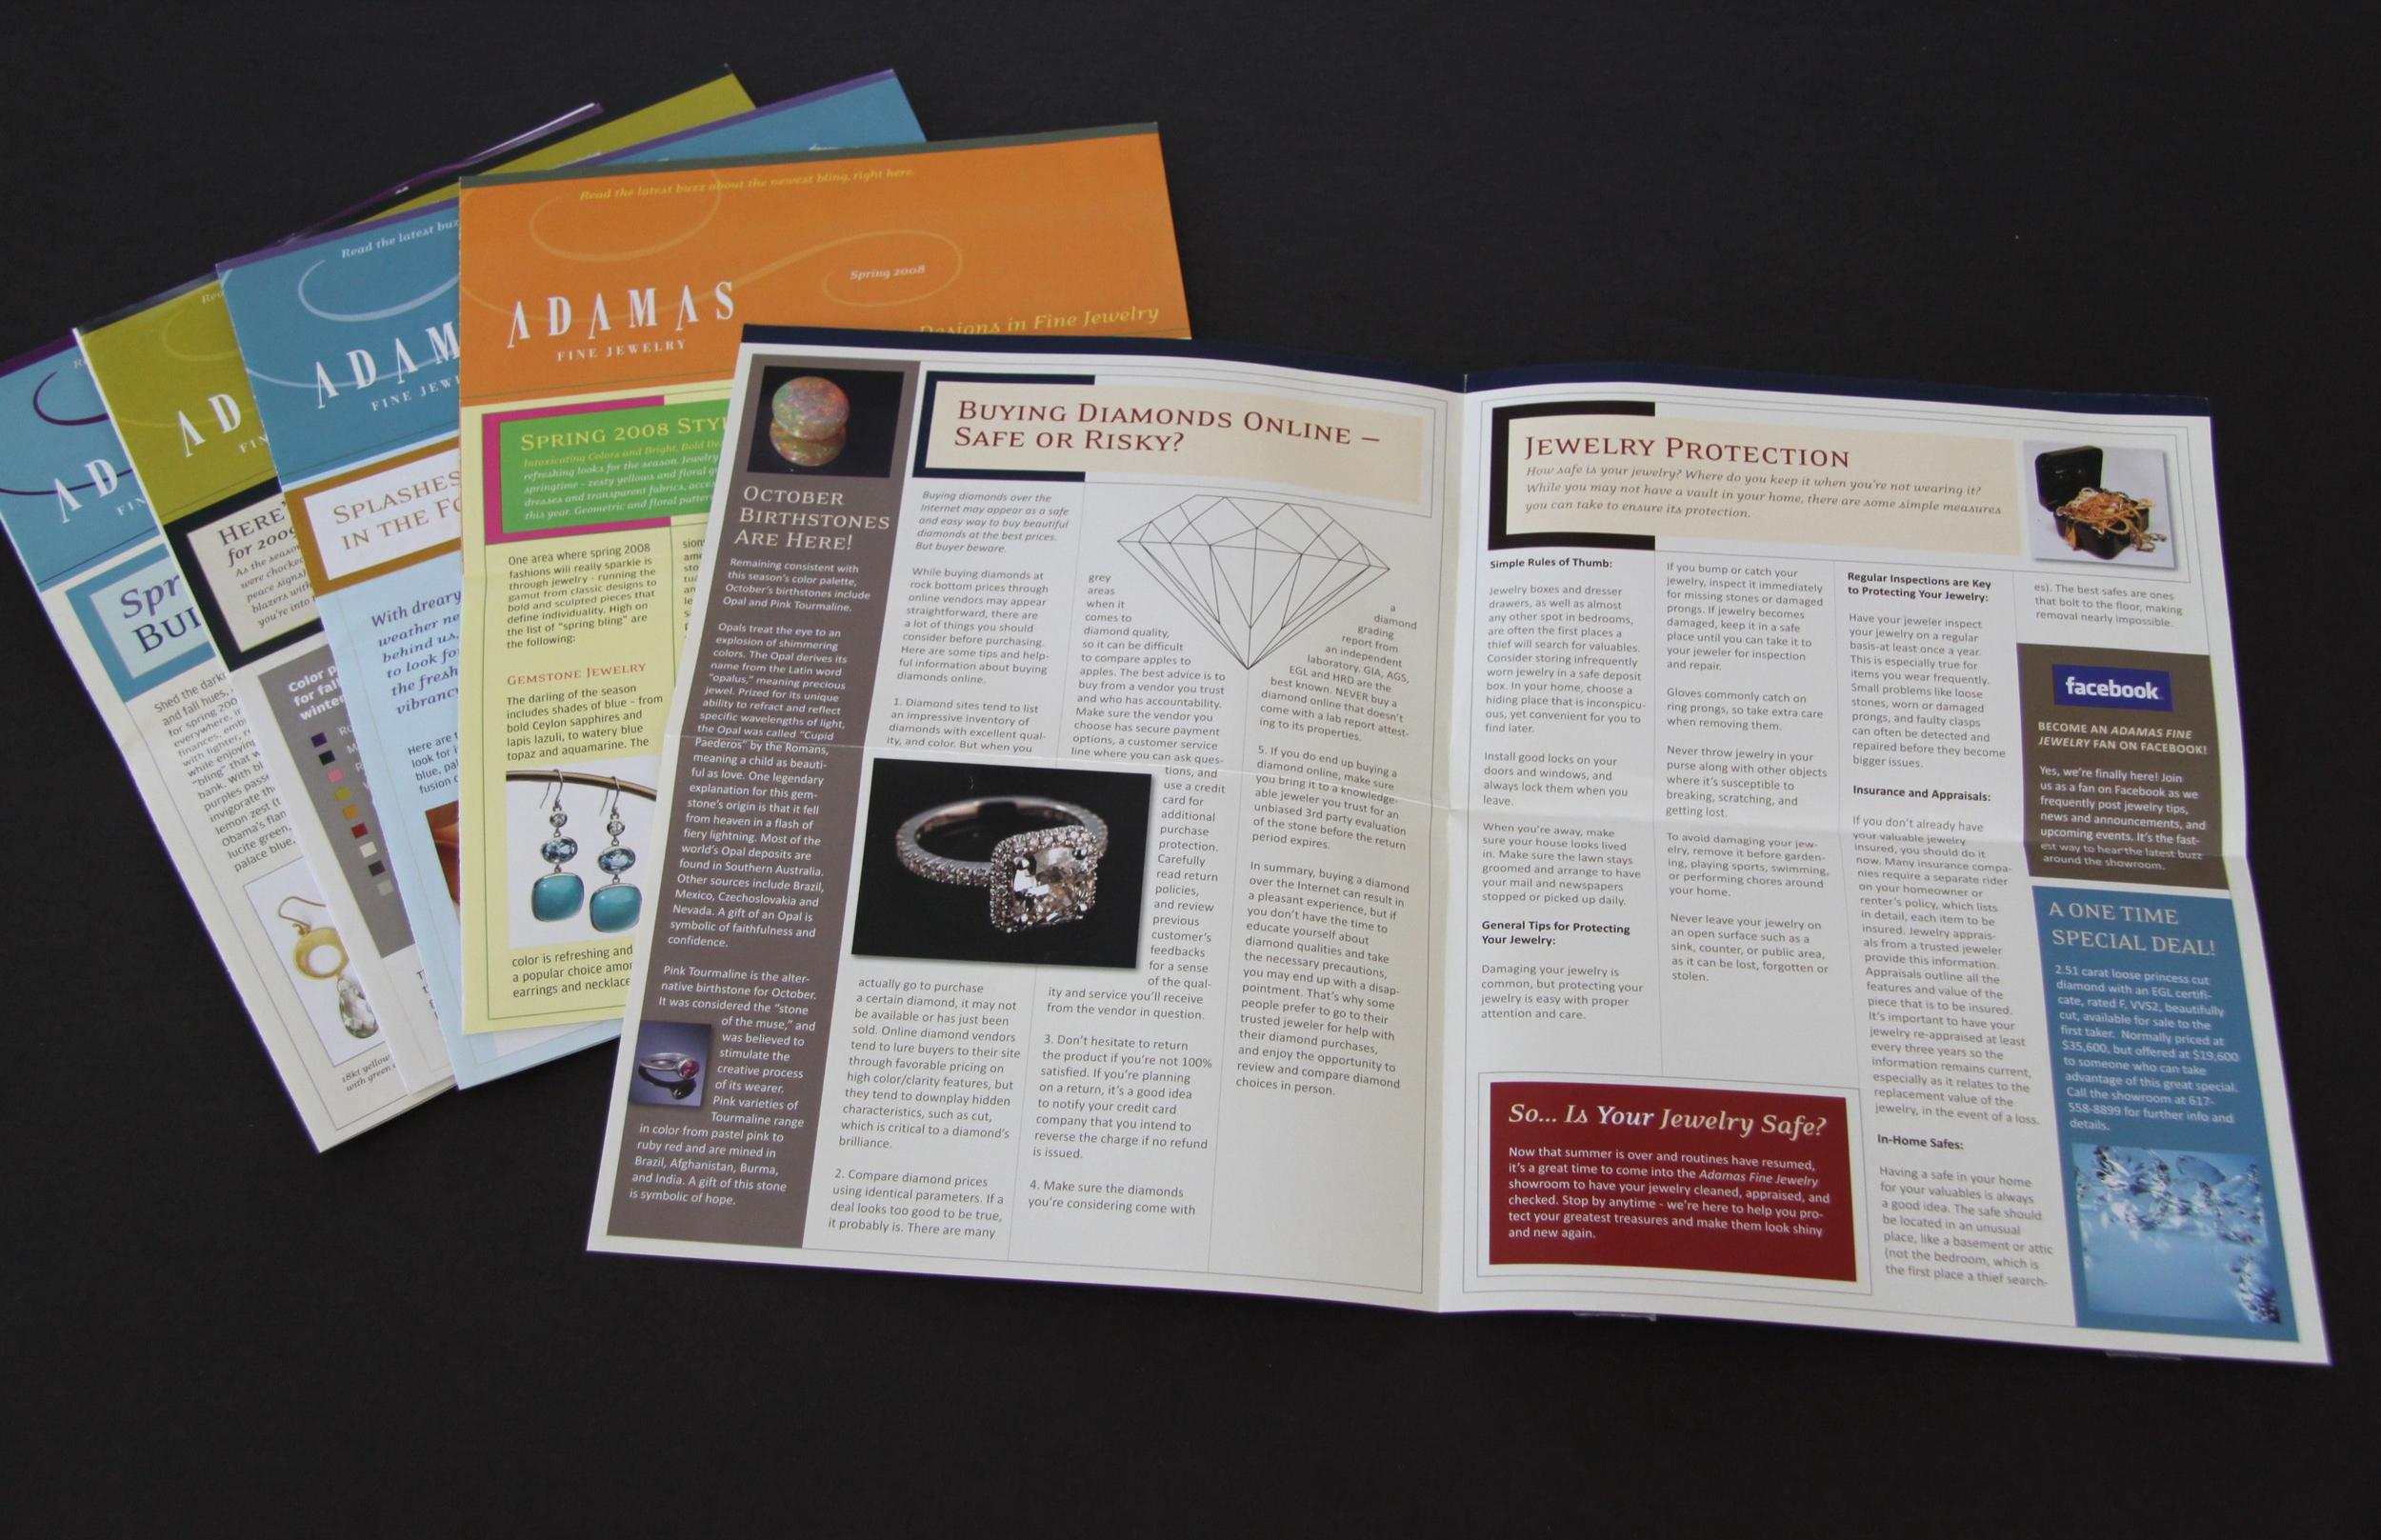 Adamas Fine Jewelry Newsletters